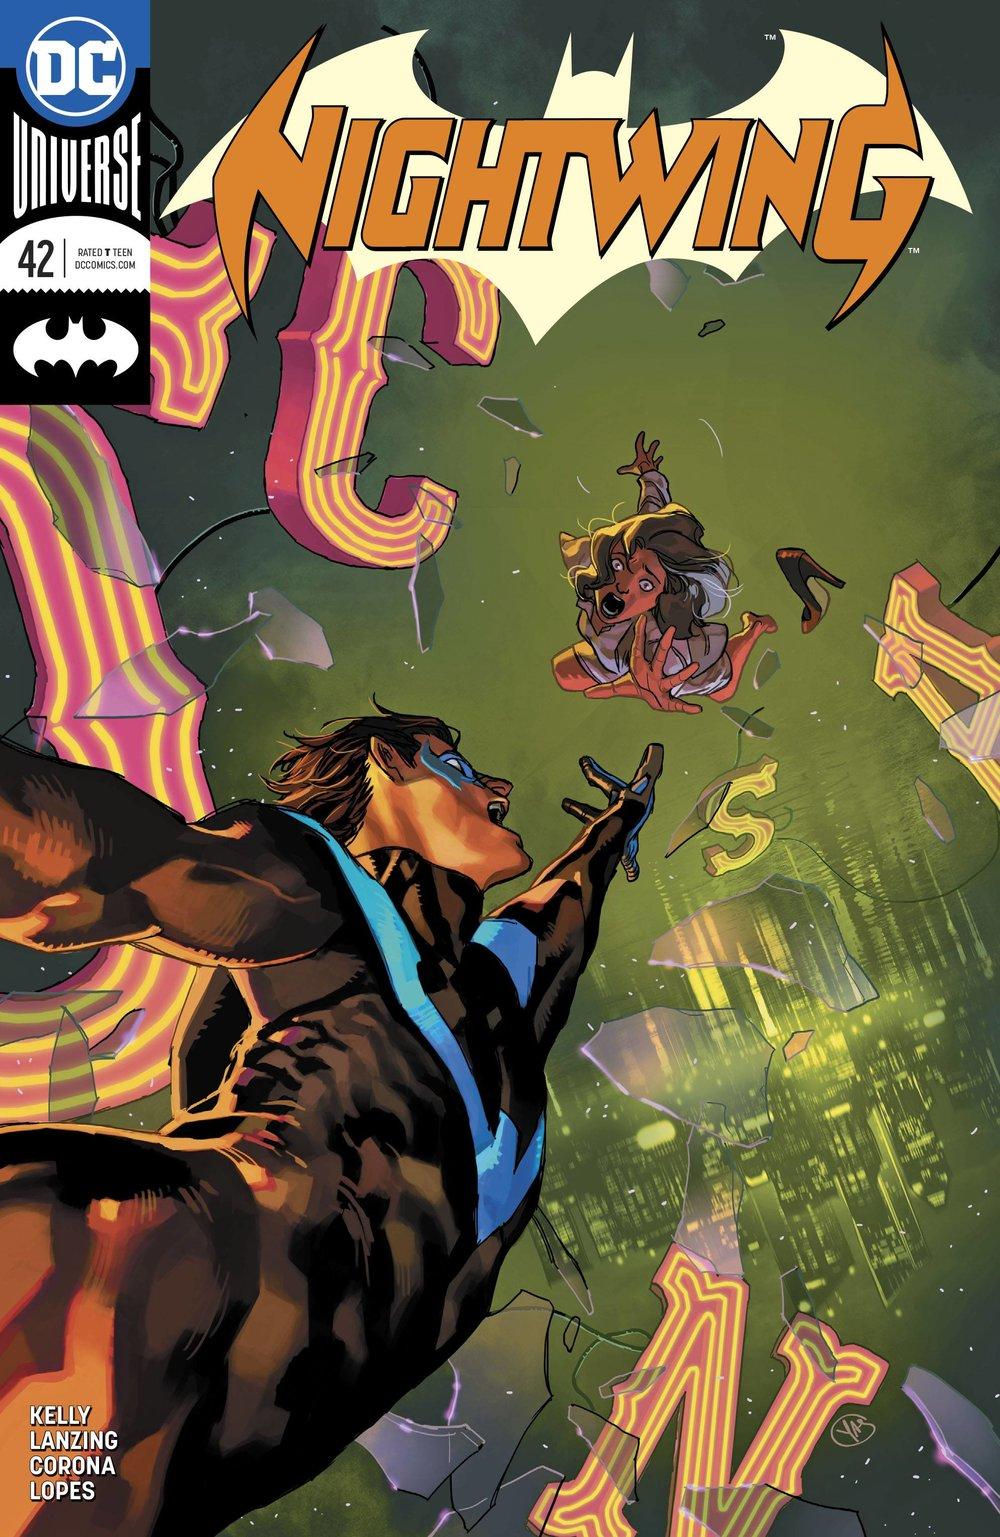 Nightwing #42